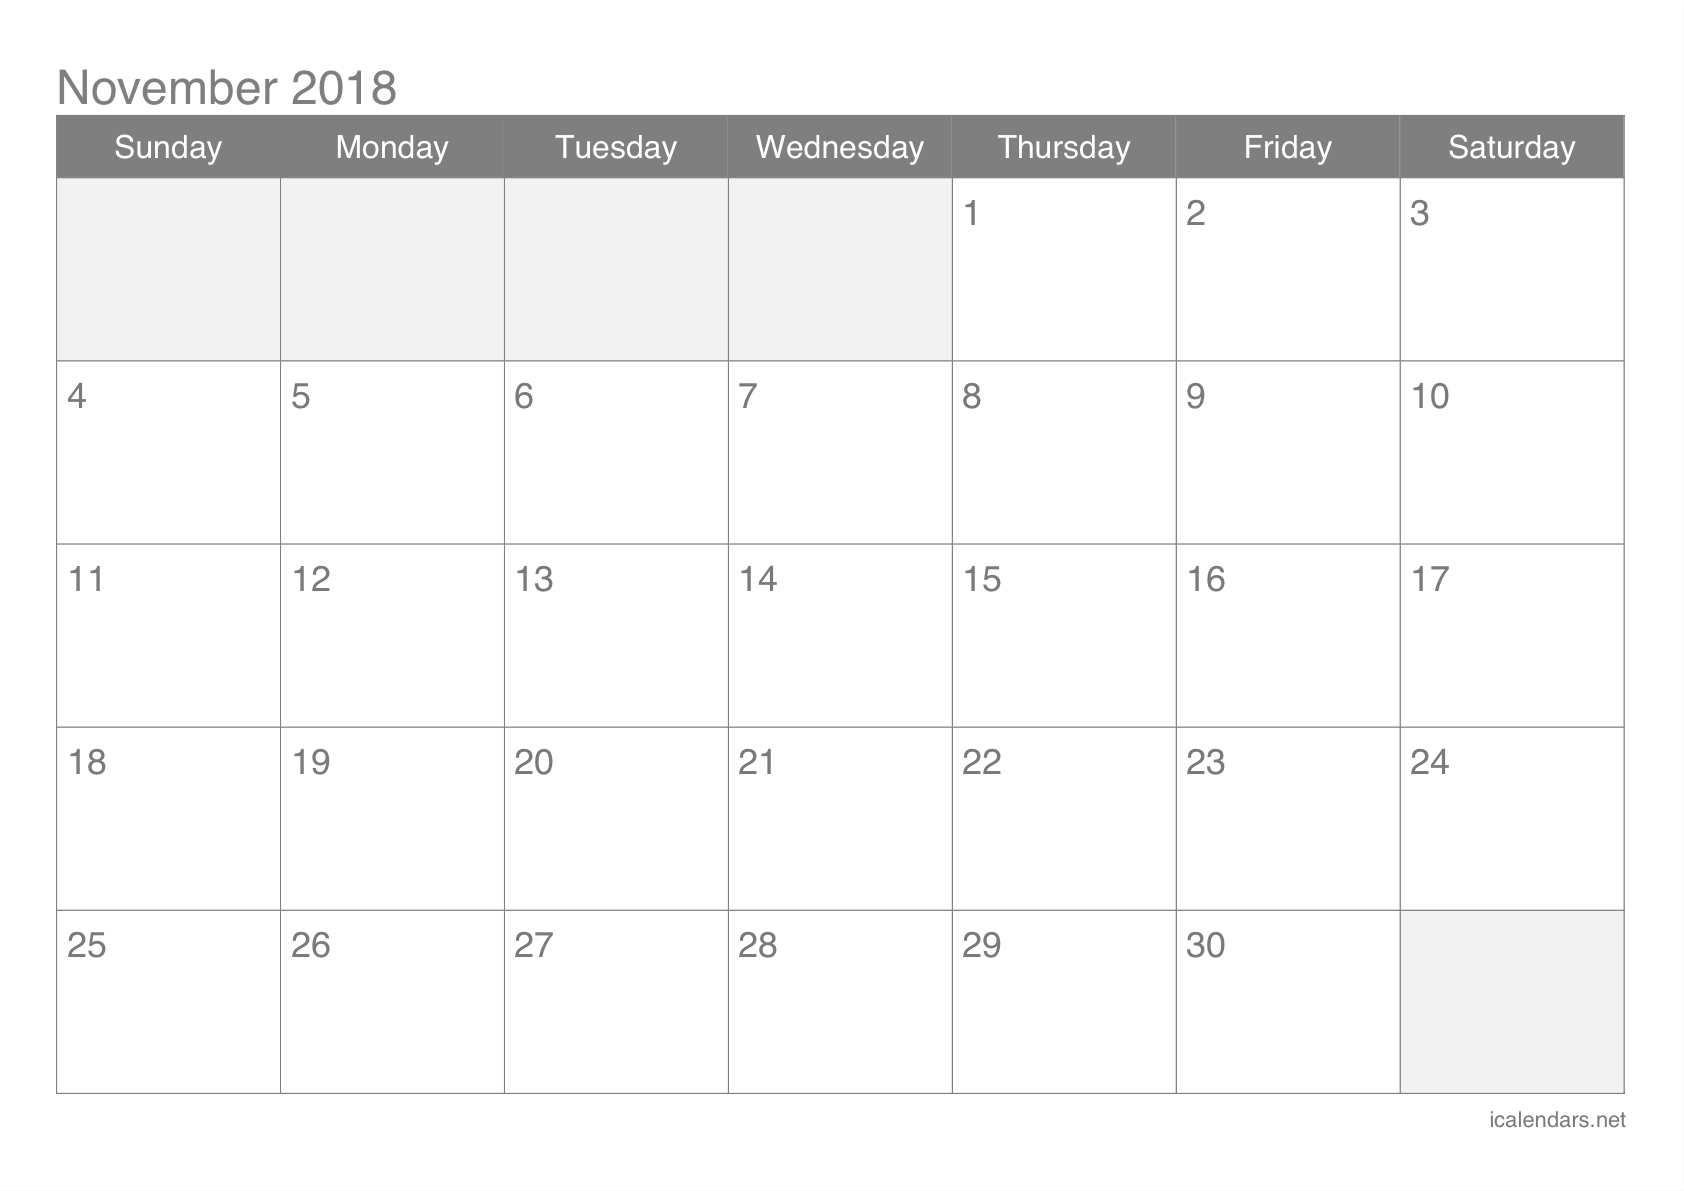 November 2018 Printable Calendar - Icalendars